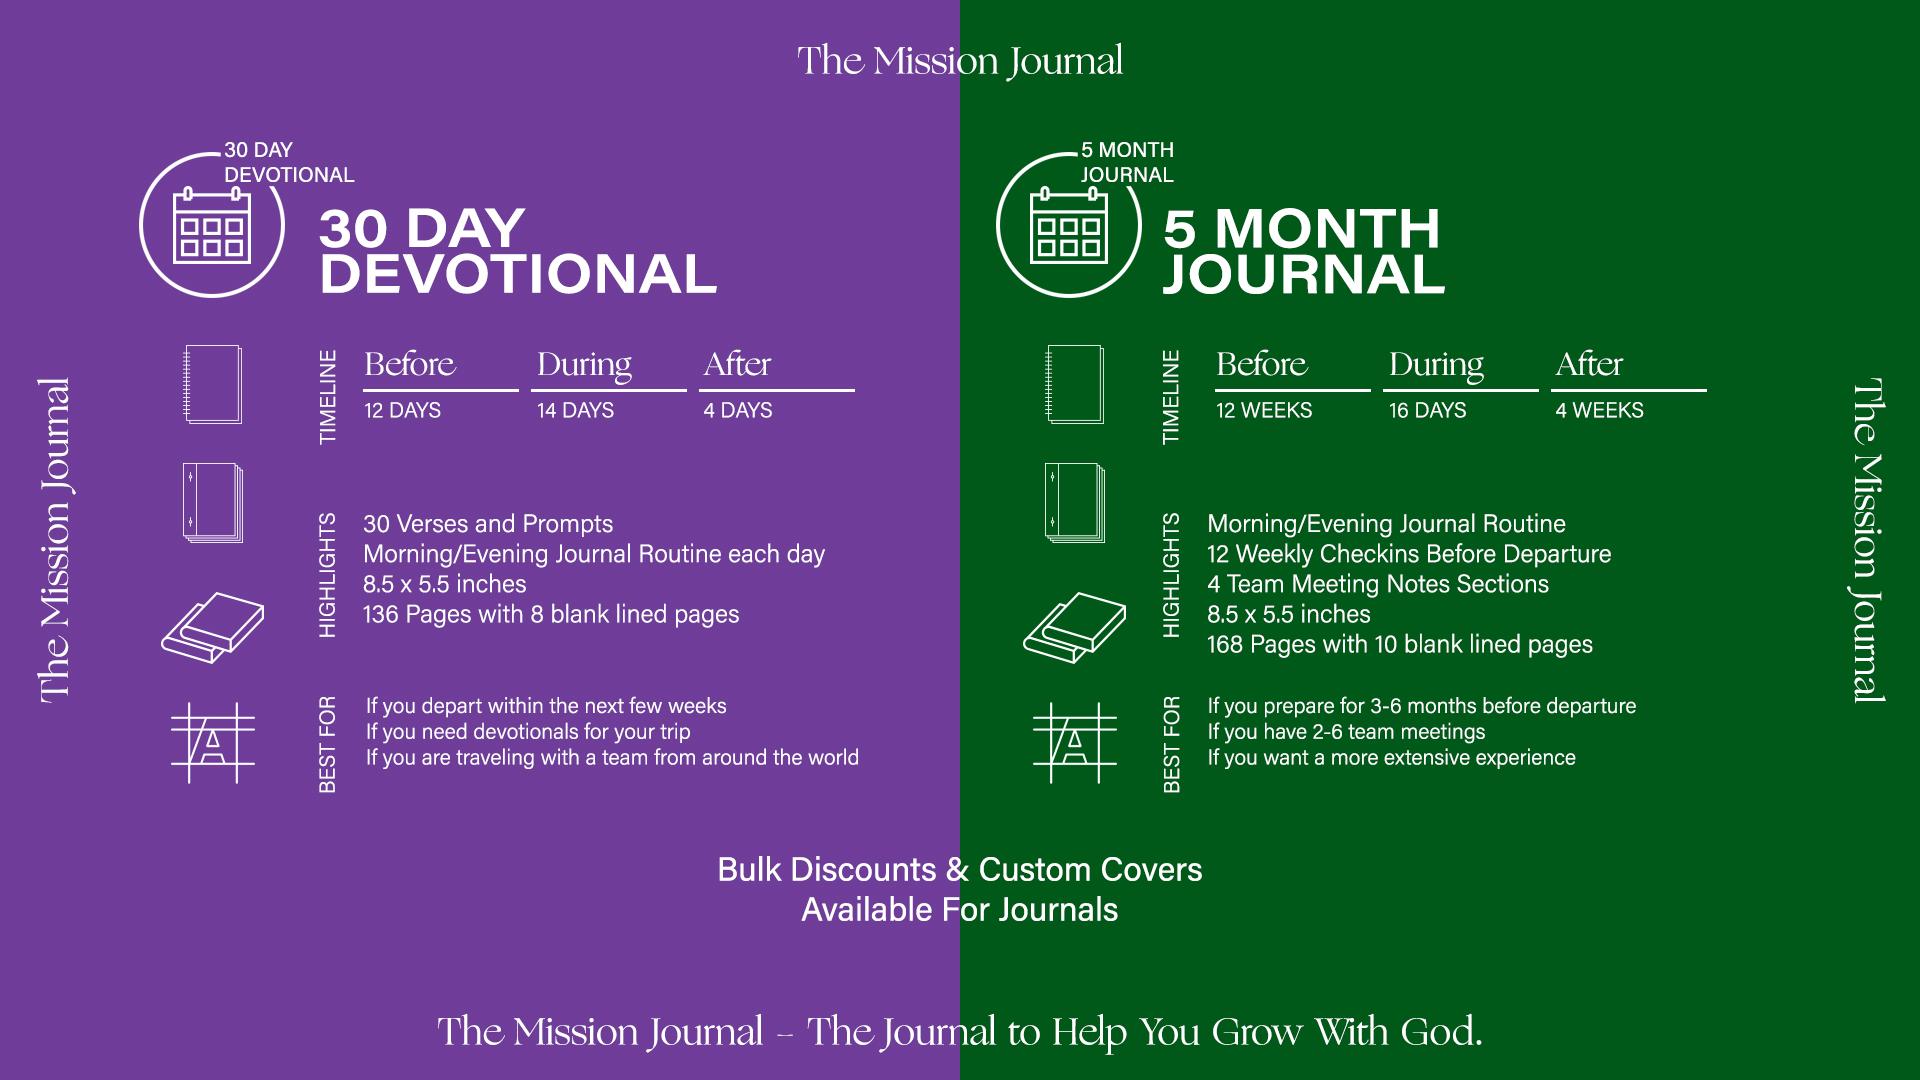 Mission Trip Journal30 Day Mission Trip Devotional Breakdown.jpg